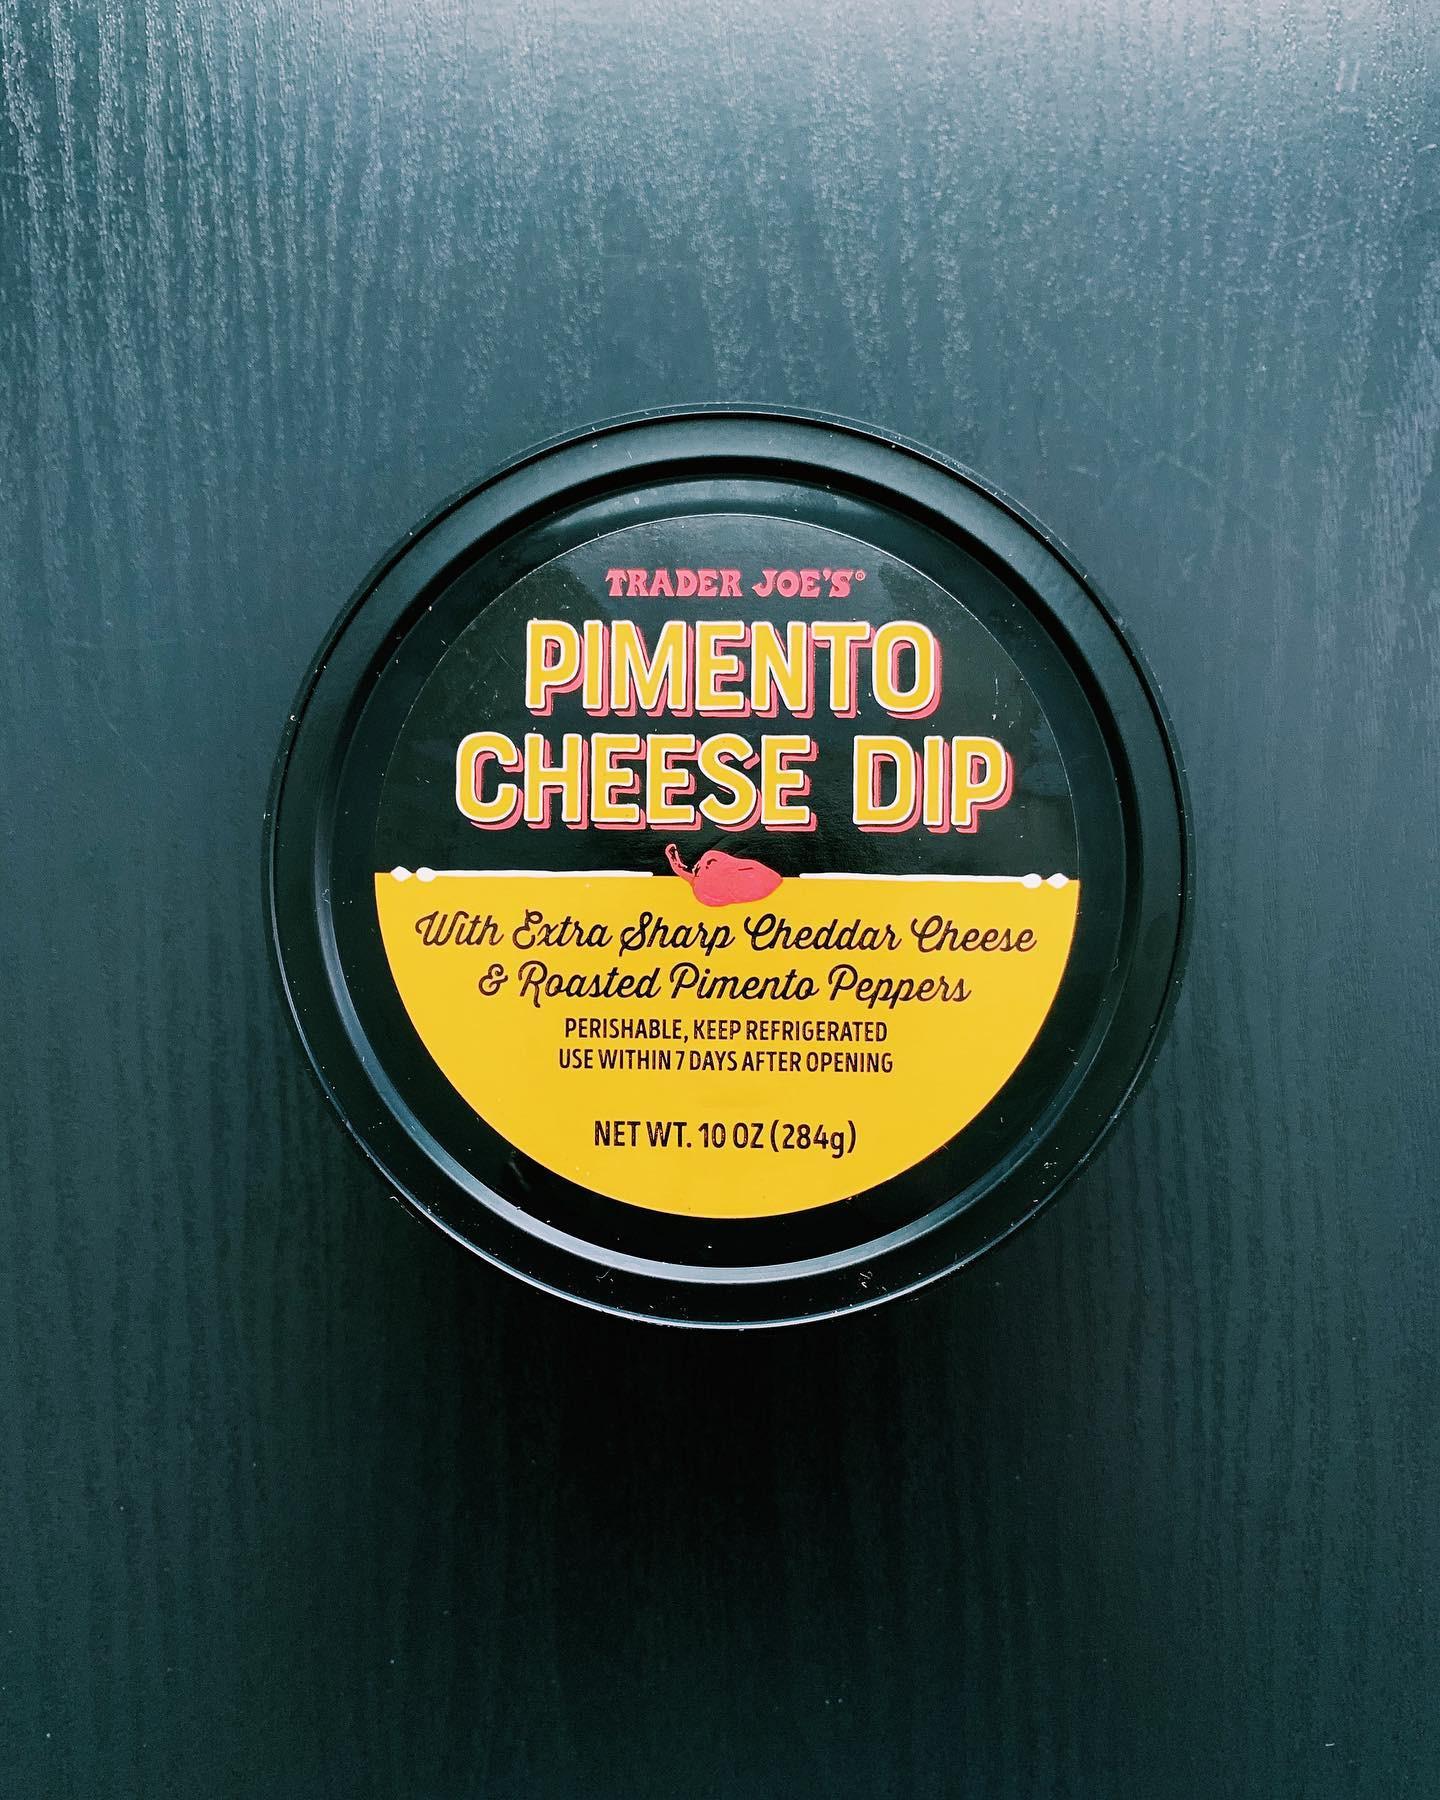 Pimento Cheese Dip: 8.5/10